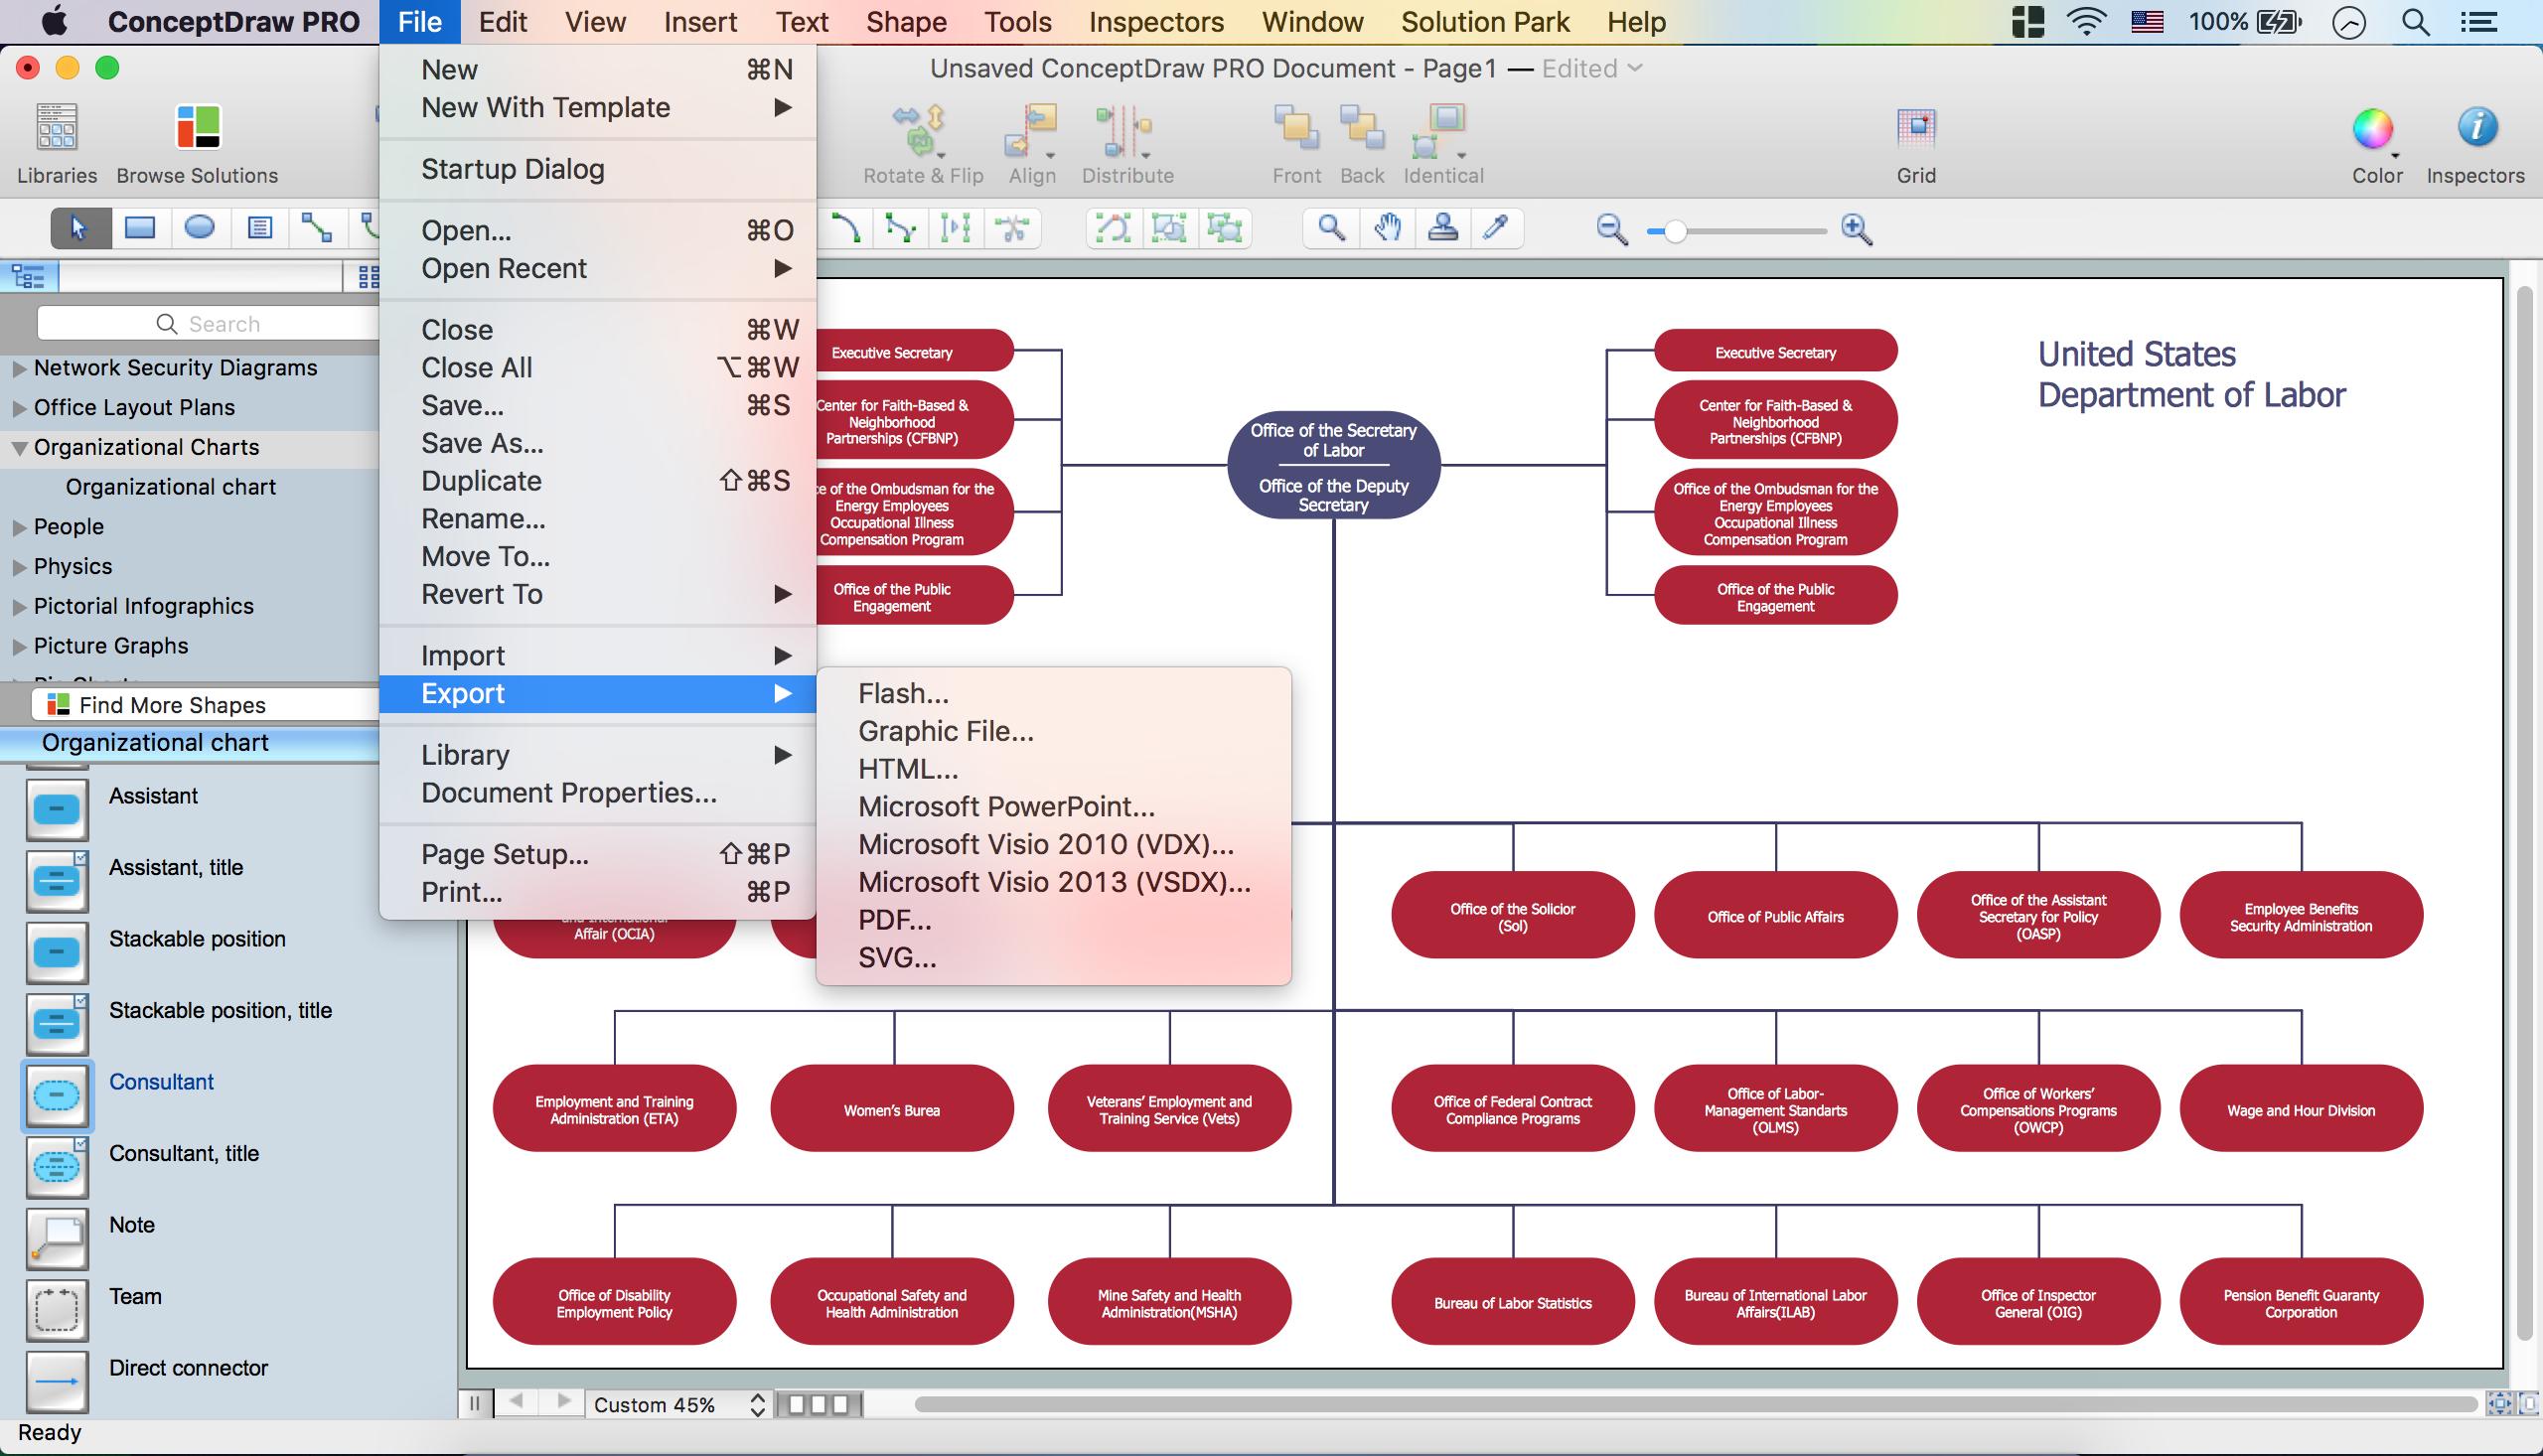 Create Organizational Chart *